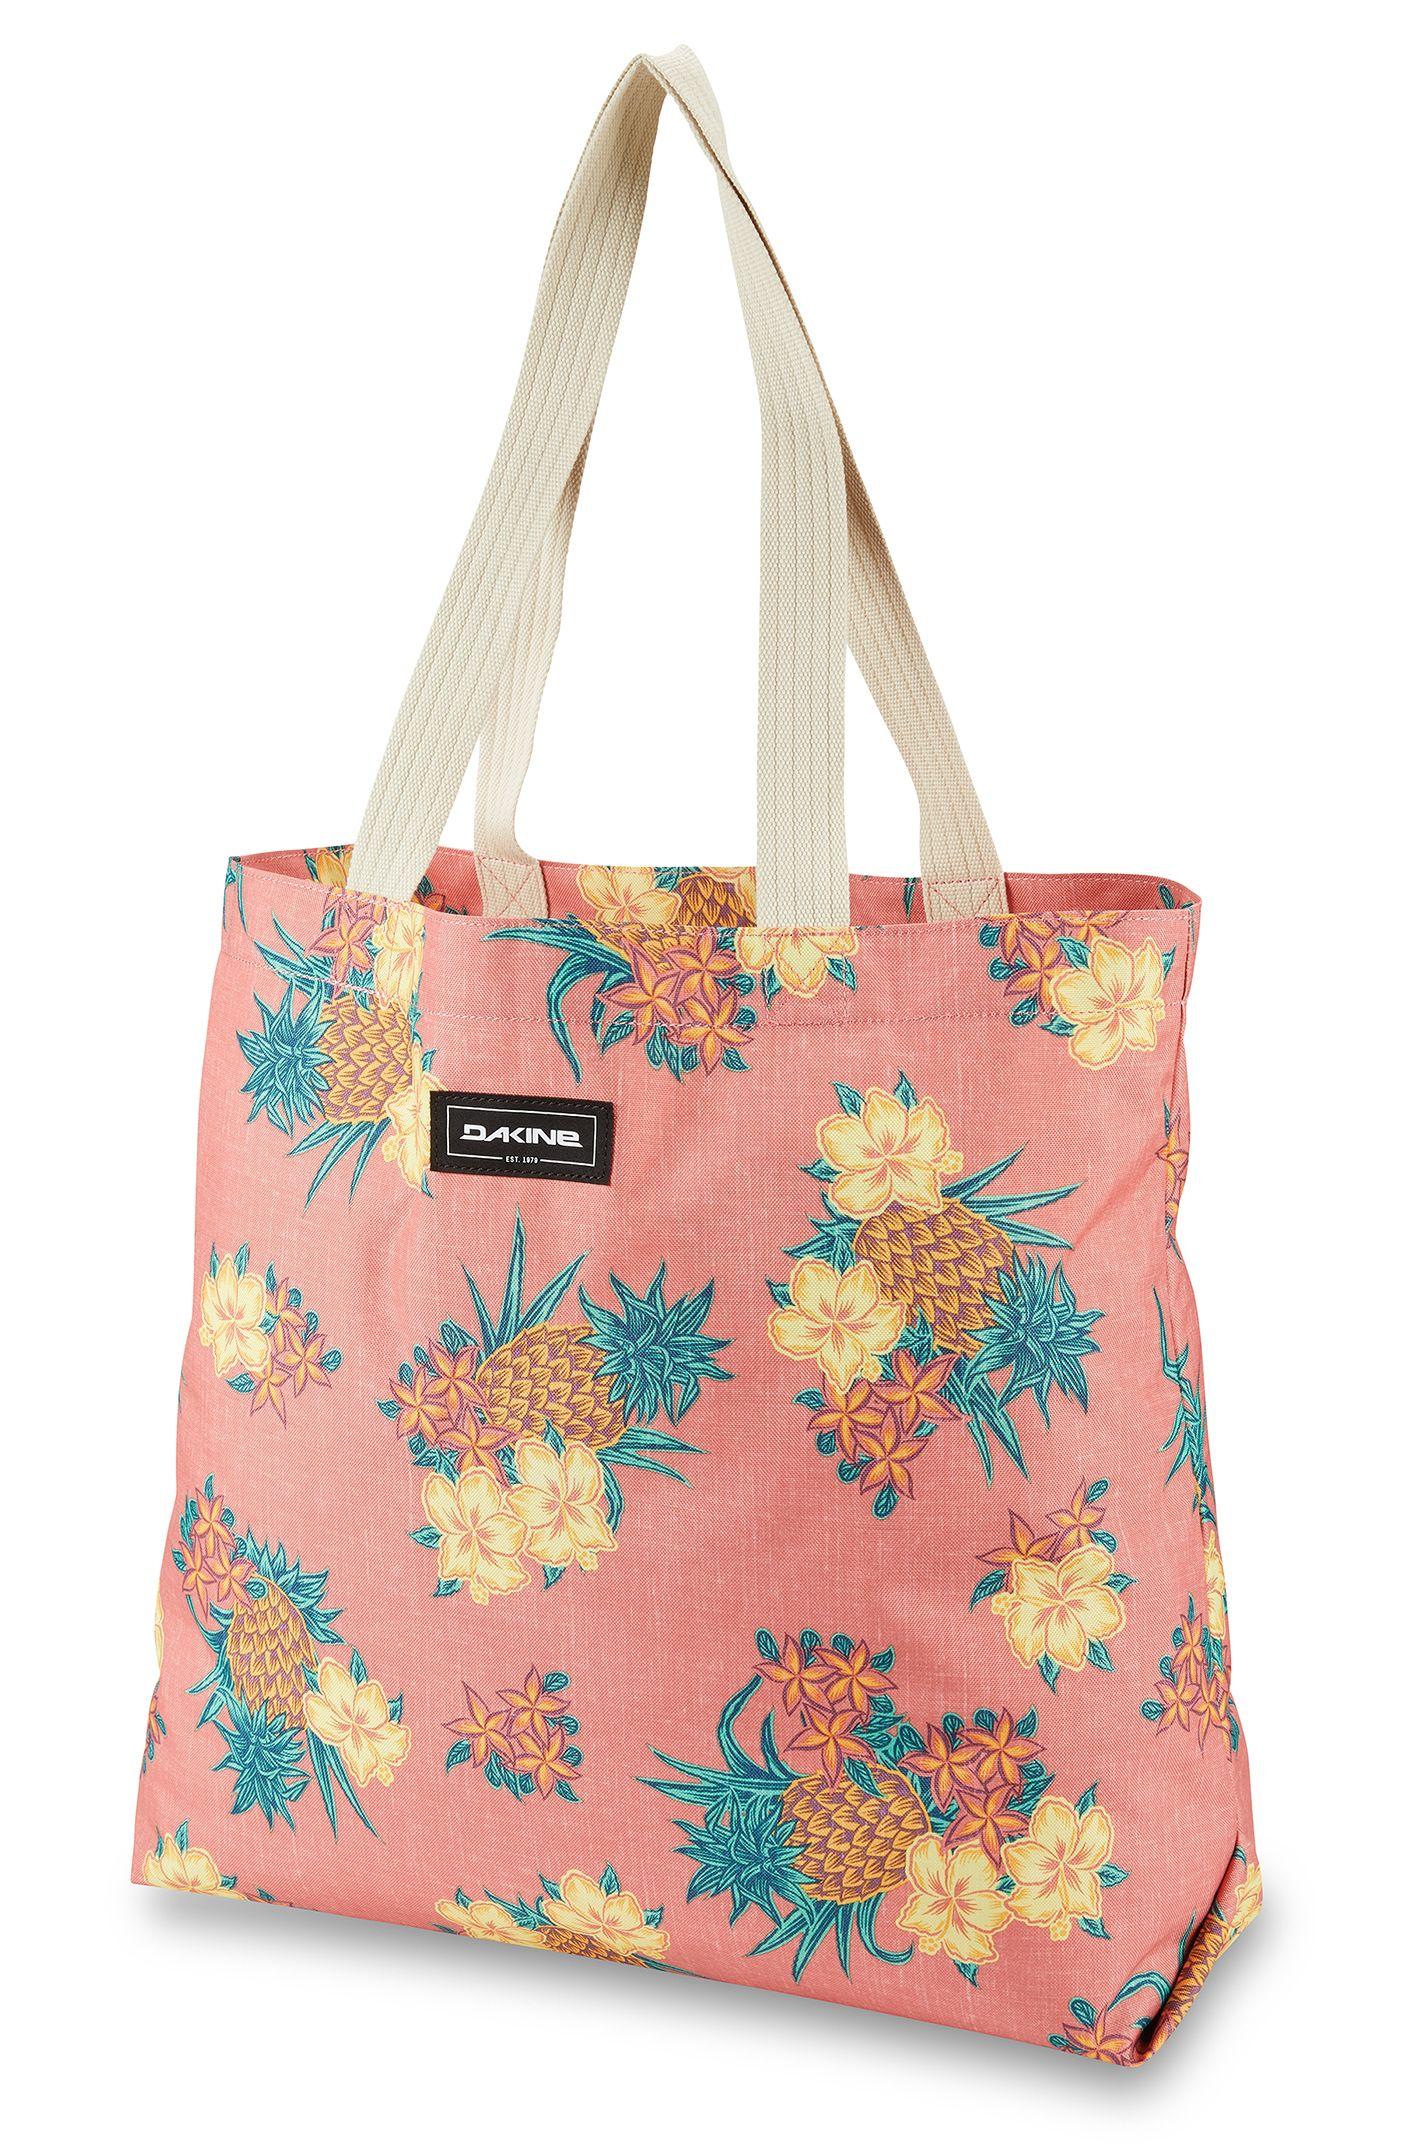 Dakine Bag  365 TOTE 28L Pineapple